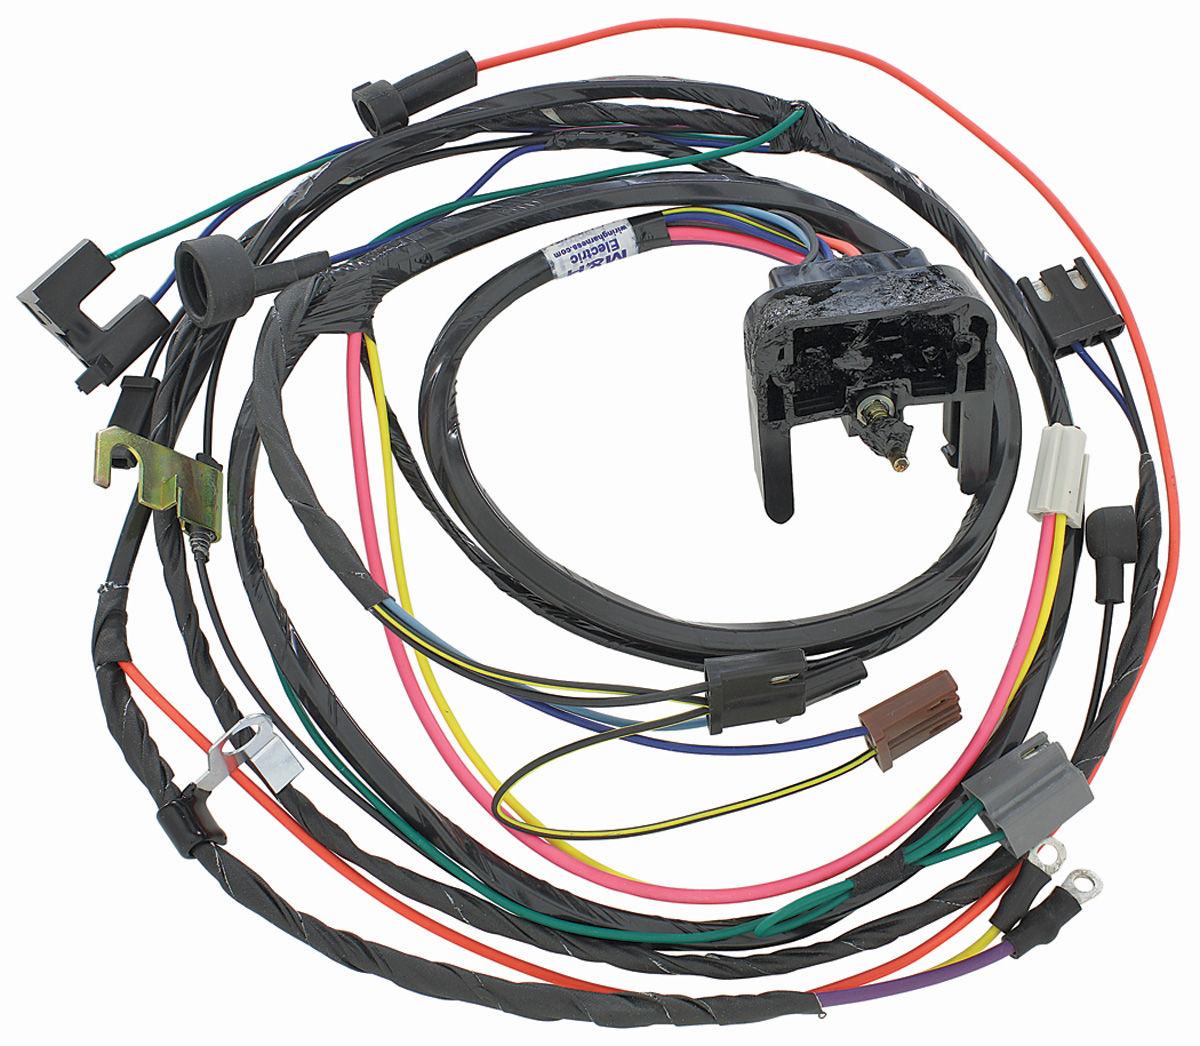 1972 el camino wiring diagram hei images gallery [ 1200 x 1046 Pixel ]